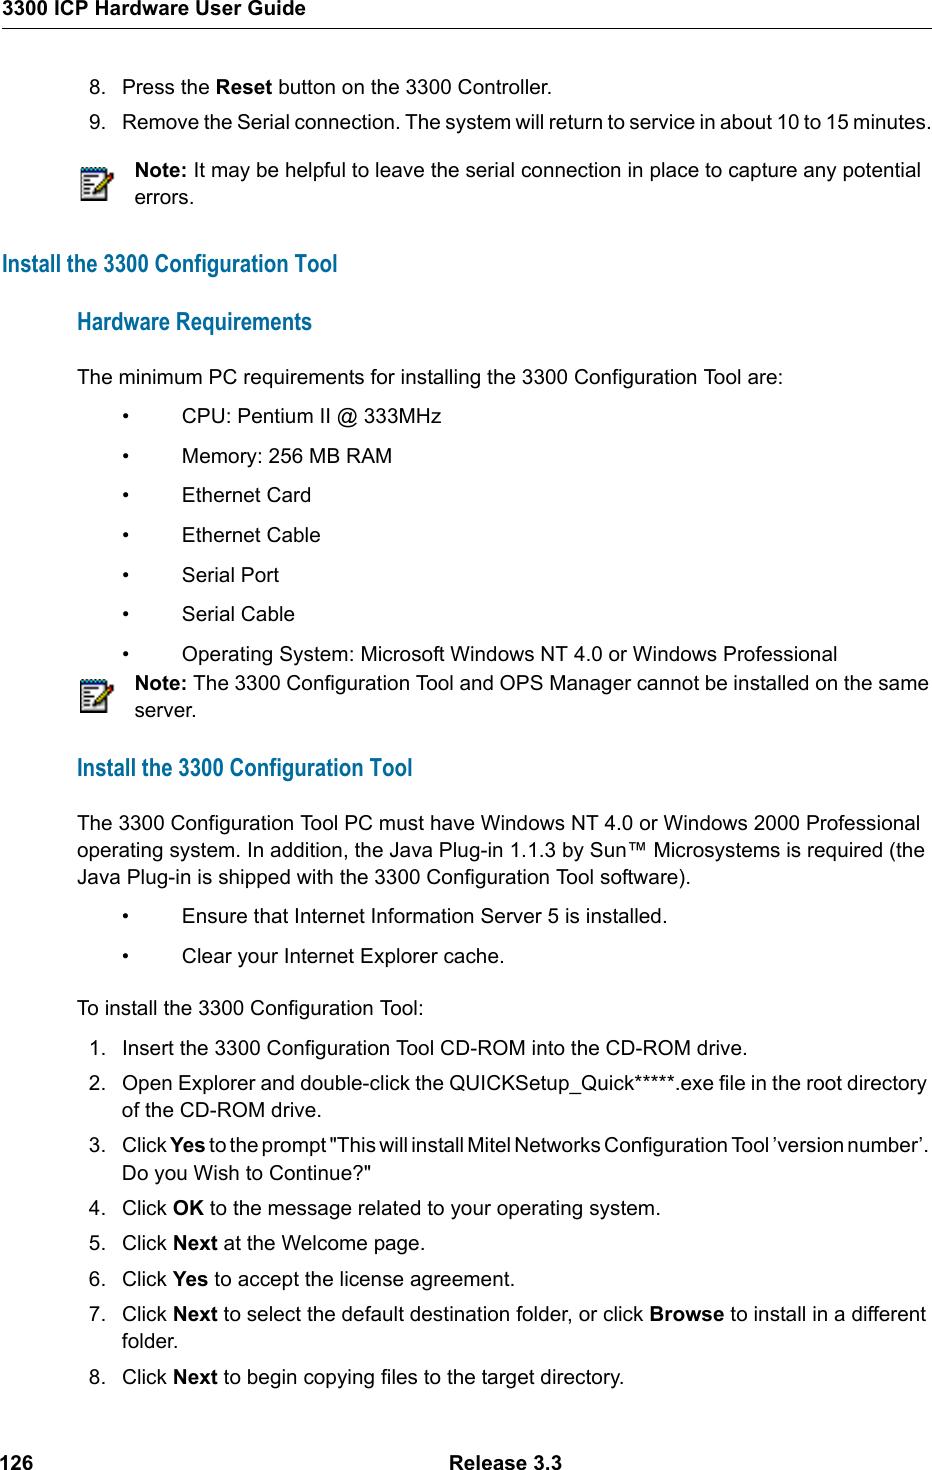 Mitel 3300 Users Manual Hardware